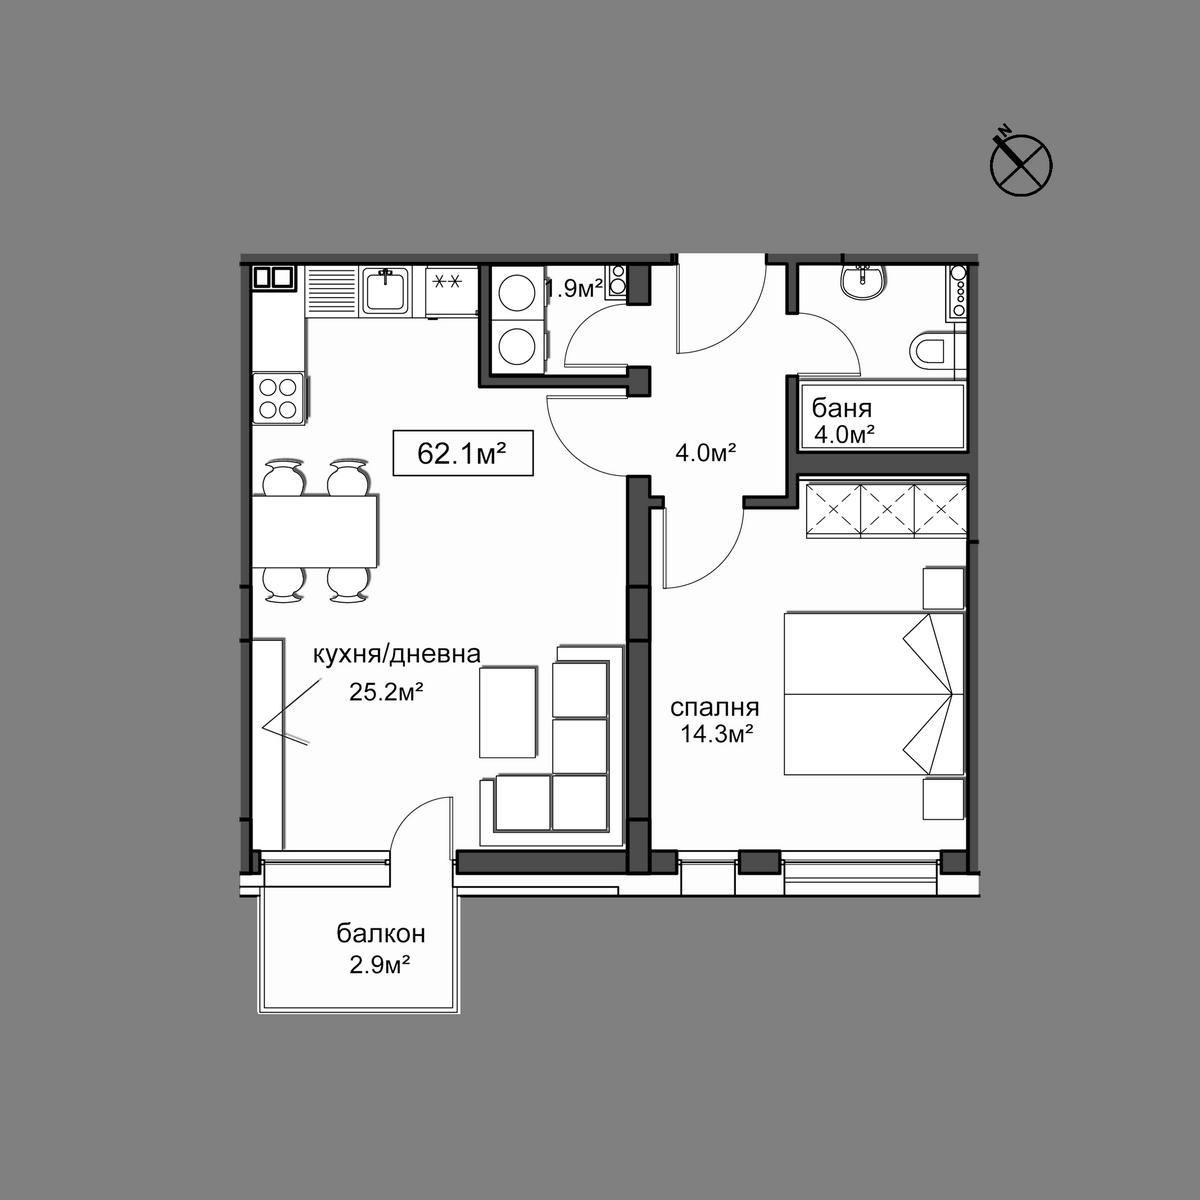 Продава апартамент - Апартамент 11